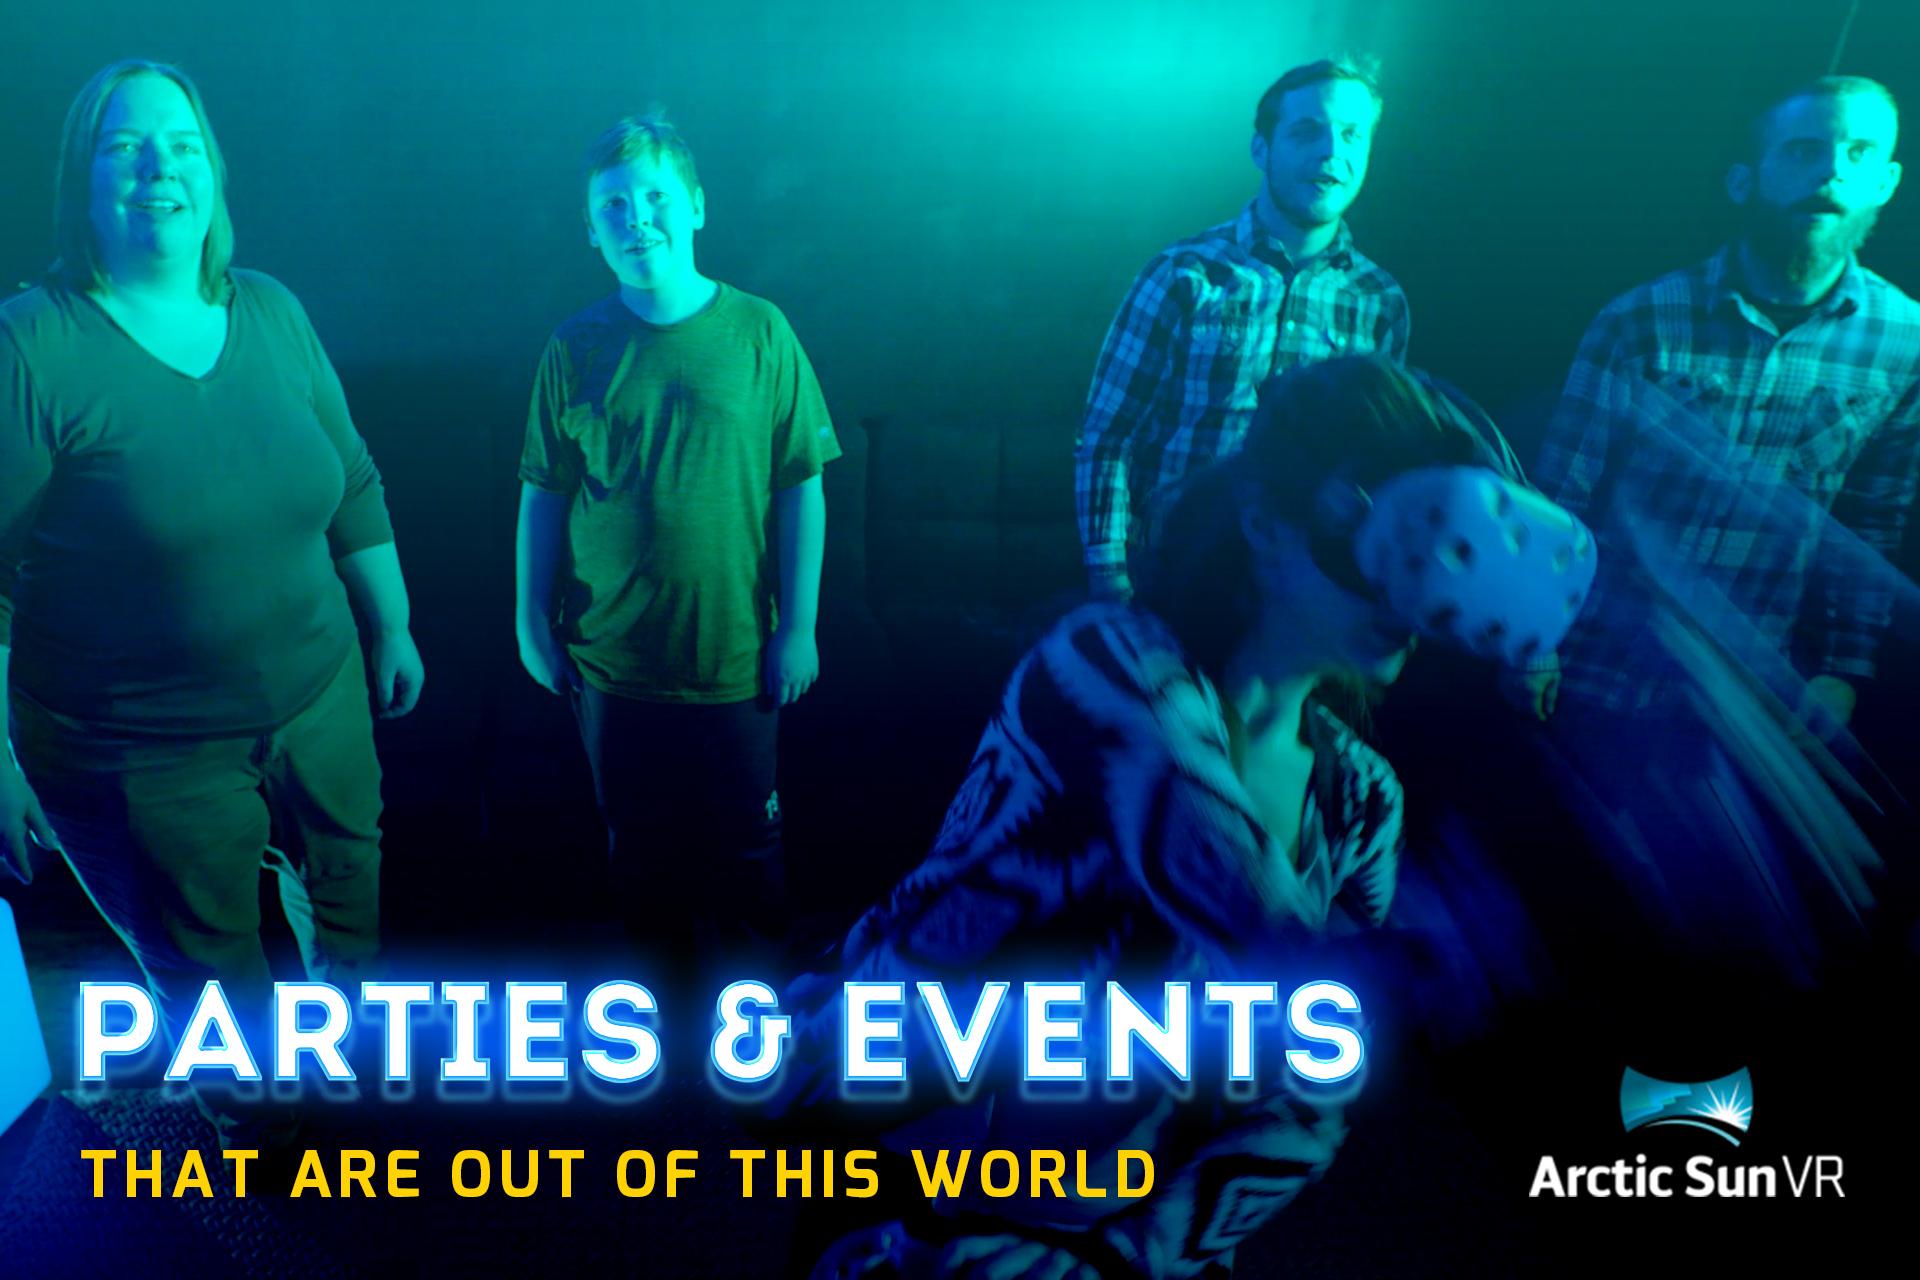 Arctic-Sun-VR-PartiesEvents-2.jpg